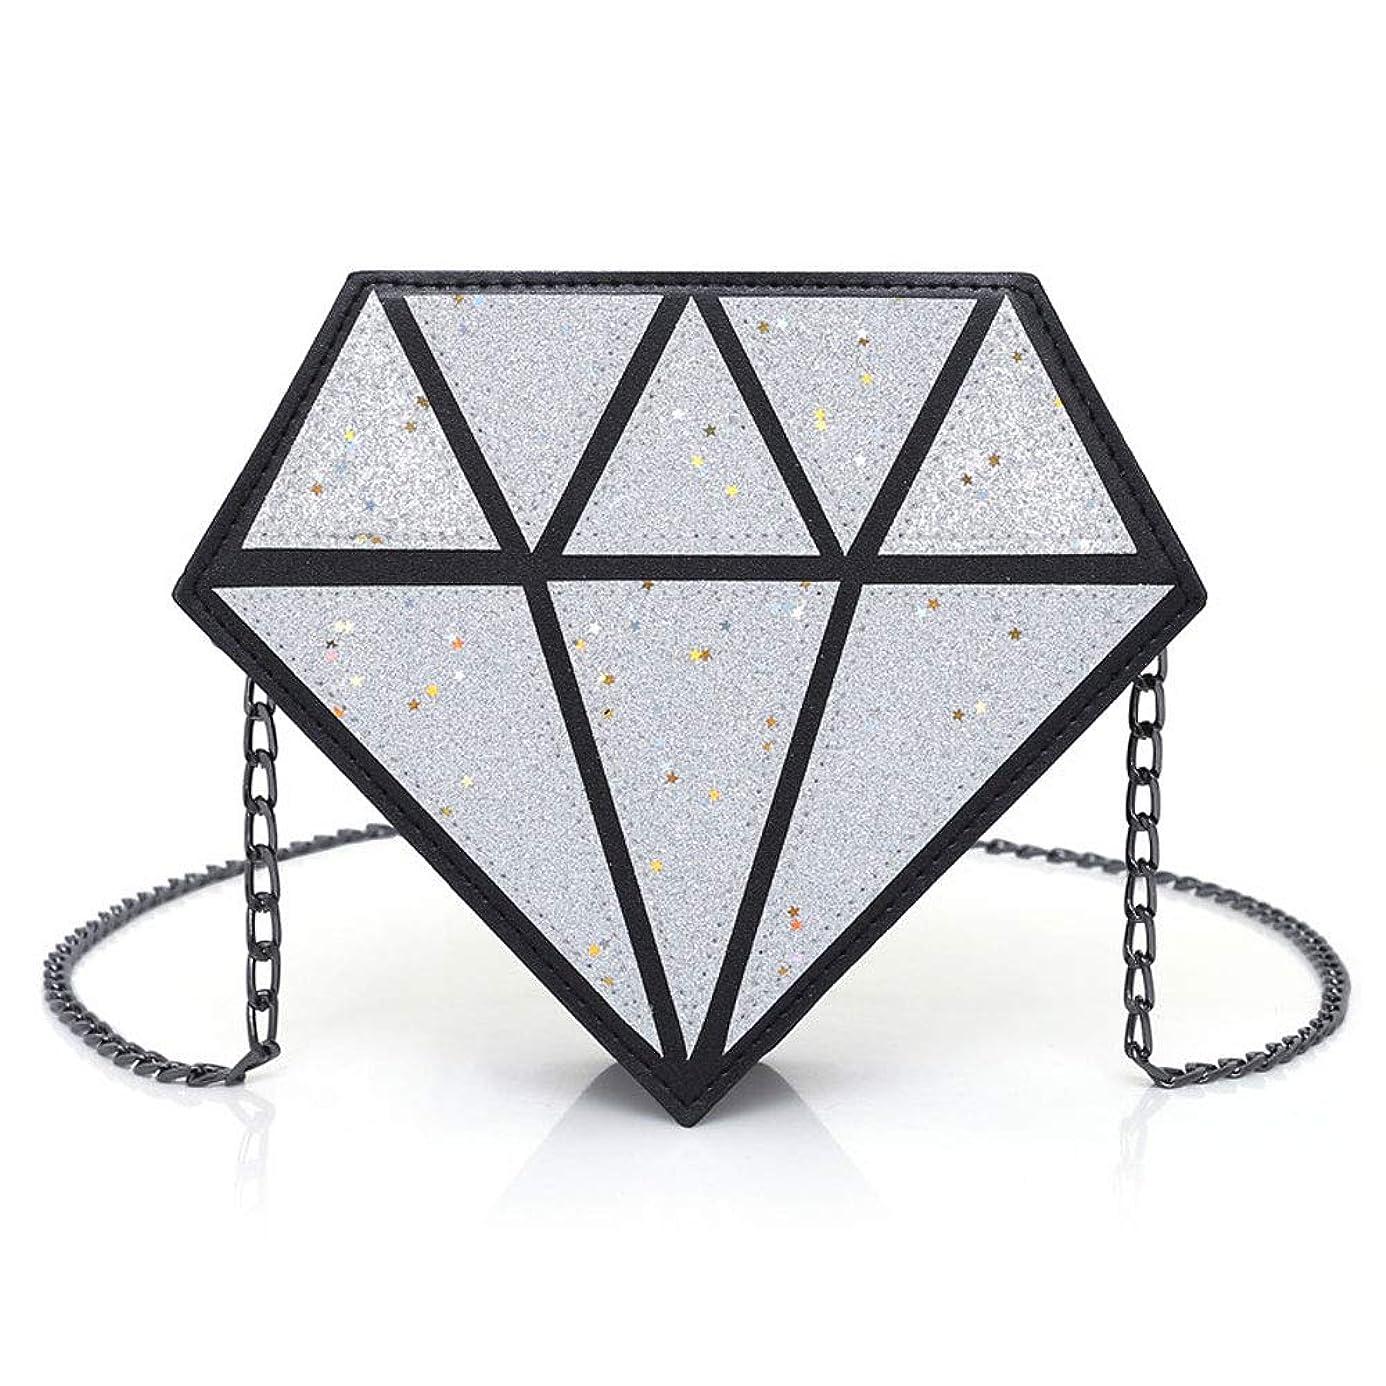 Lixibei Lady's Small Bag, Diamond Shiny Shoulder Slung Handbags Cool Packet Crystal Mini Crossbody Bag Small Tote Purse Cell Phone Wallet Girls Ladies Women